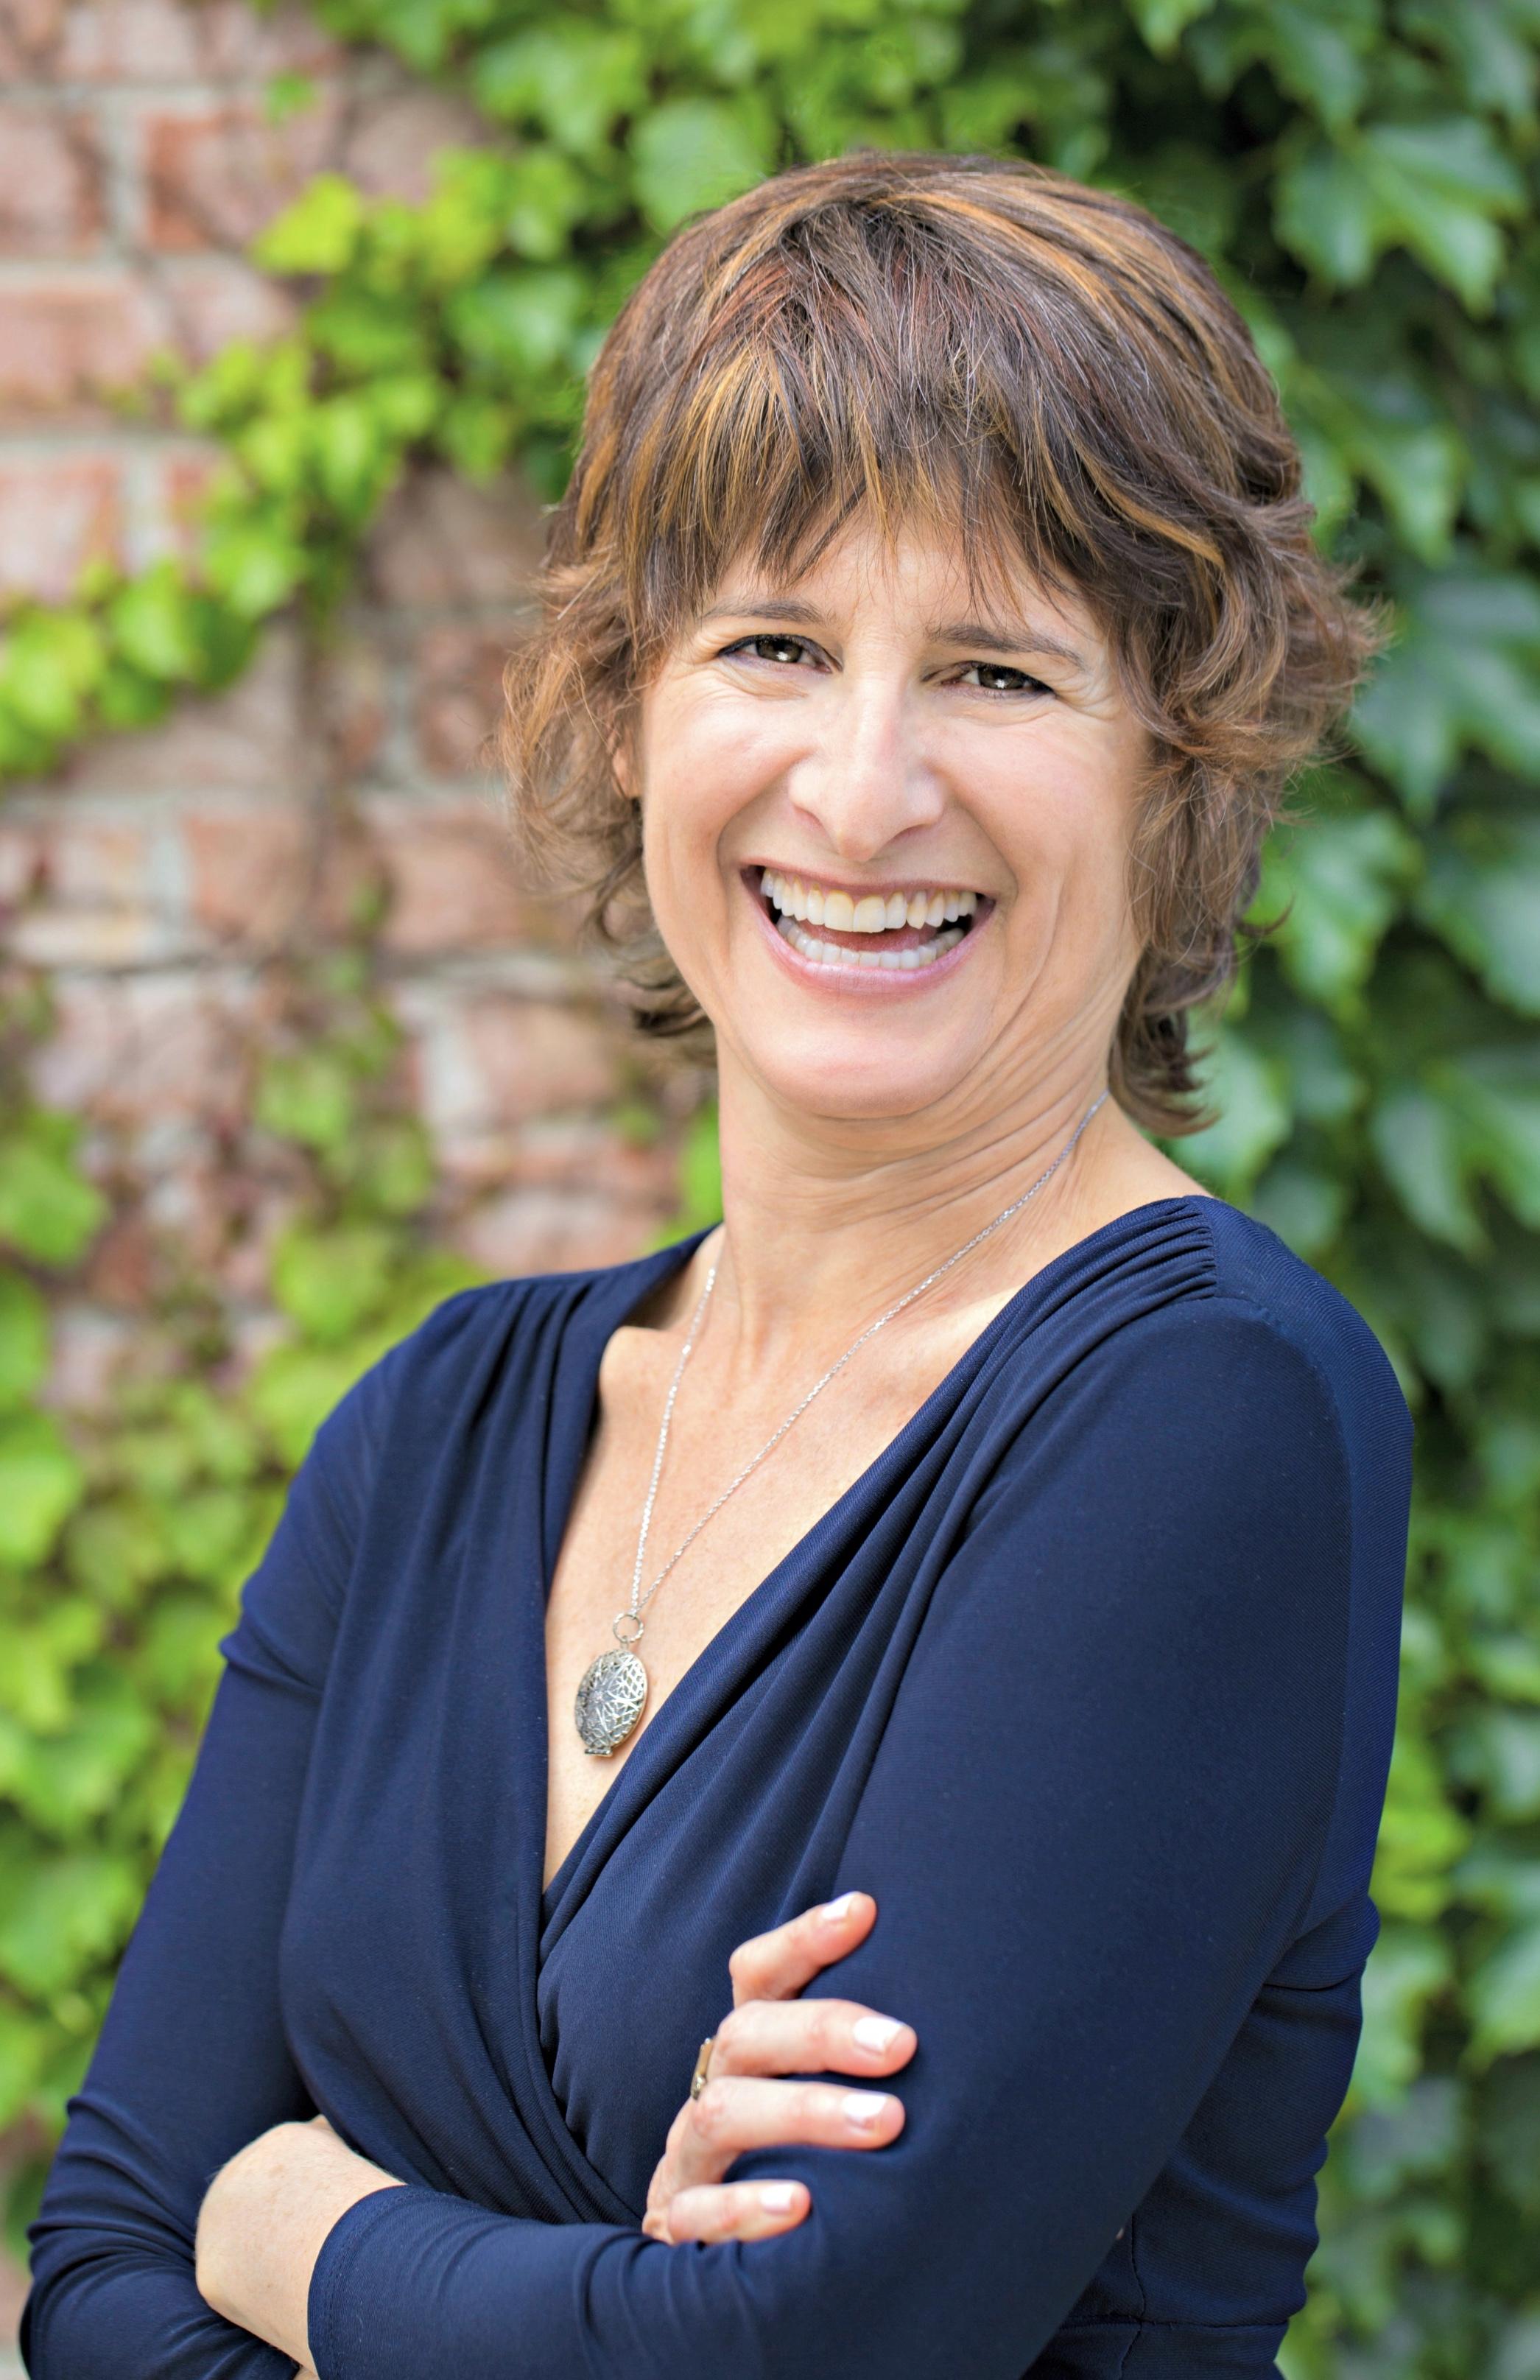 Claudia Braun Holistic Health & Lifestyle Coach